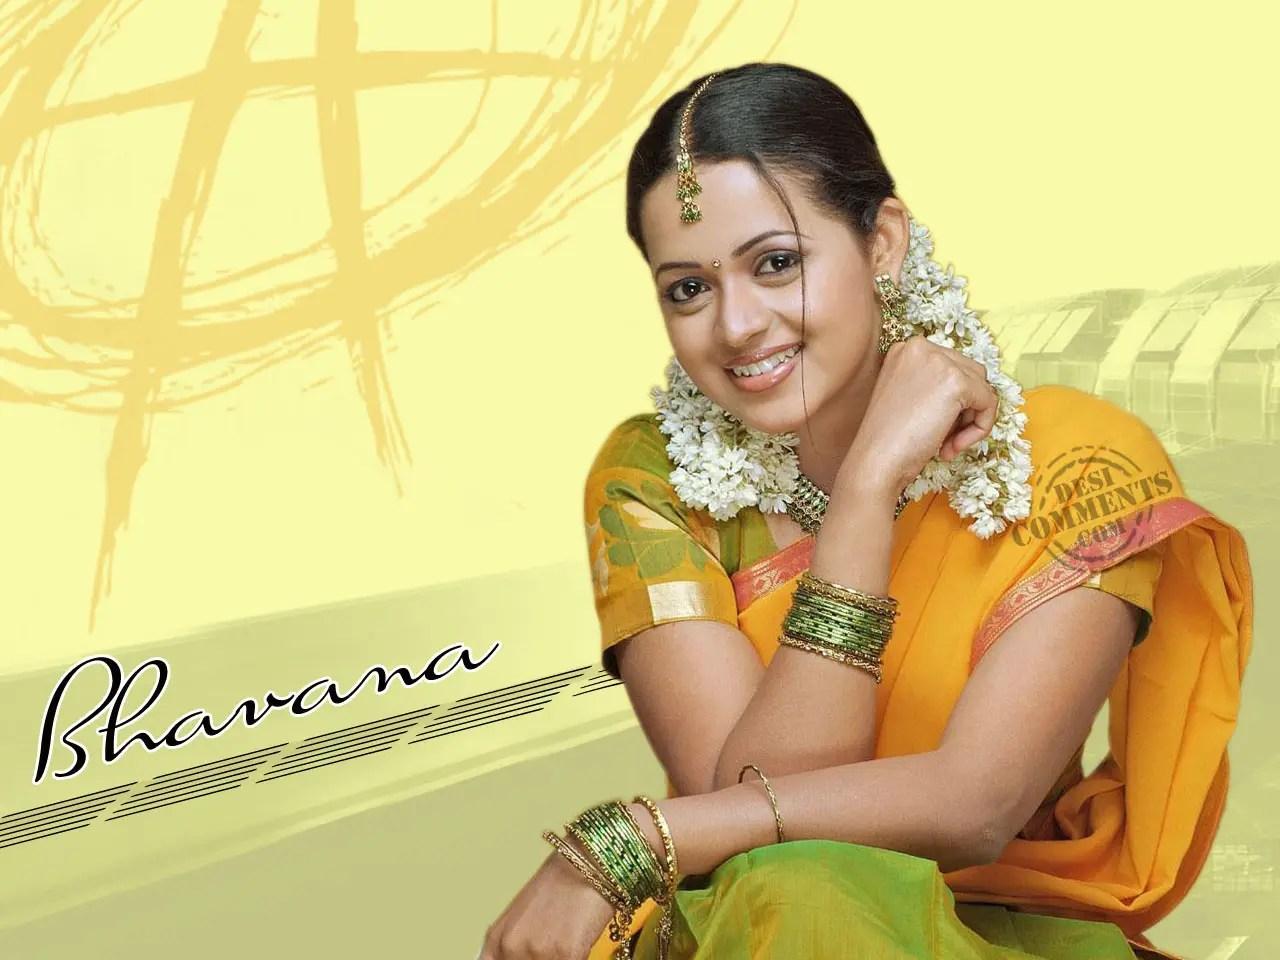 Punjabi Girl With Gun Hd Wallpaper Bhavana Wallpapers South Indian Celebrities Page 2